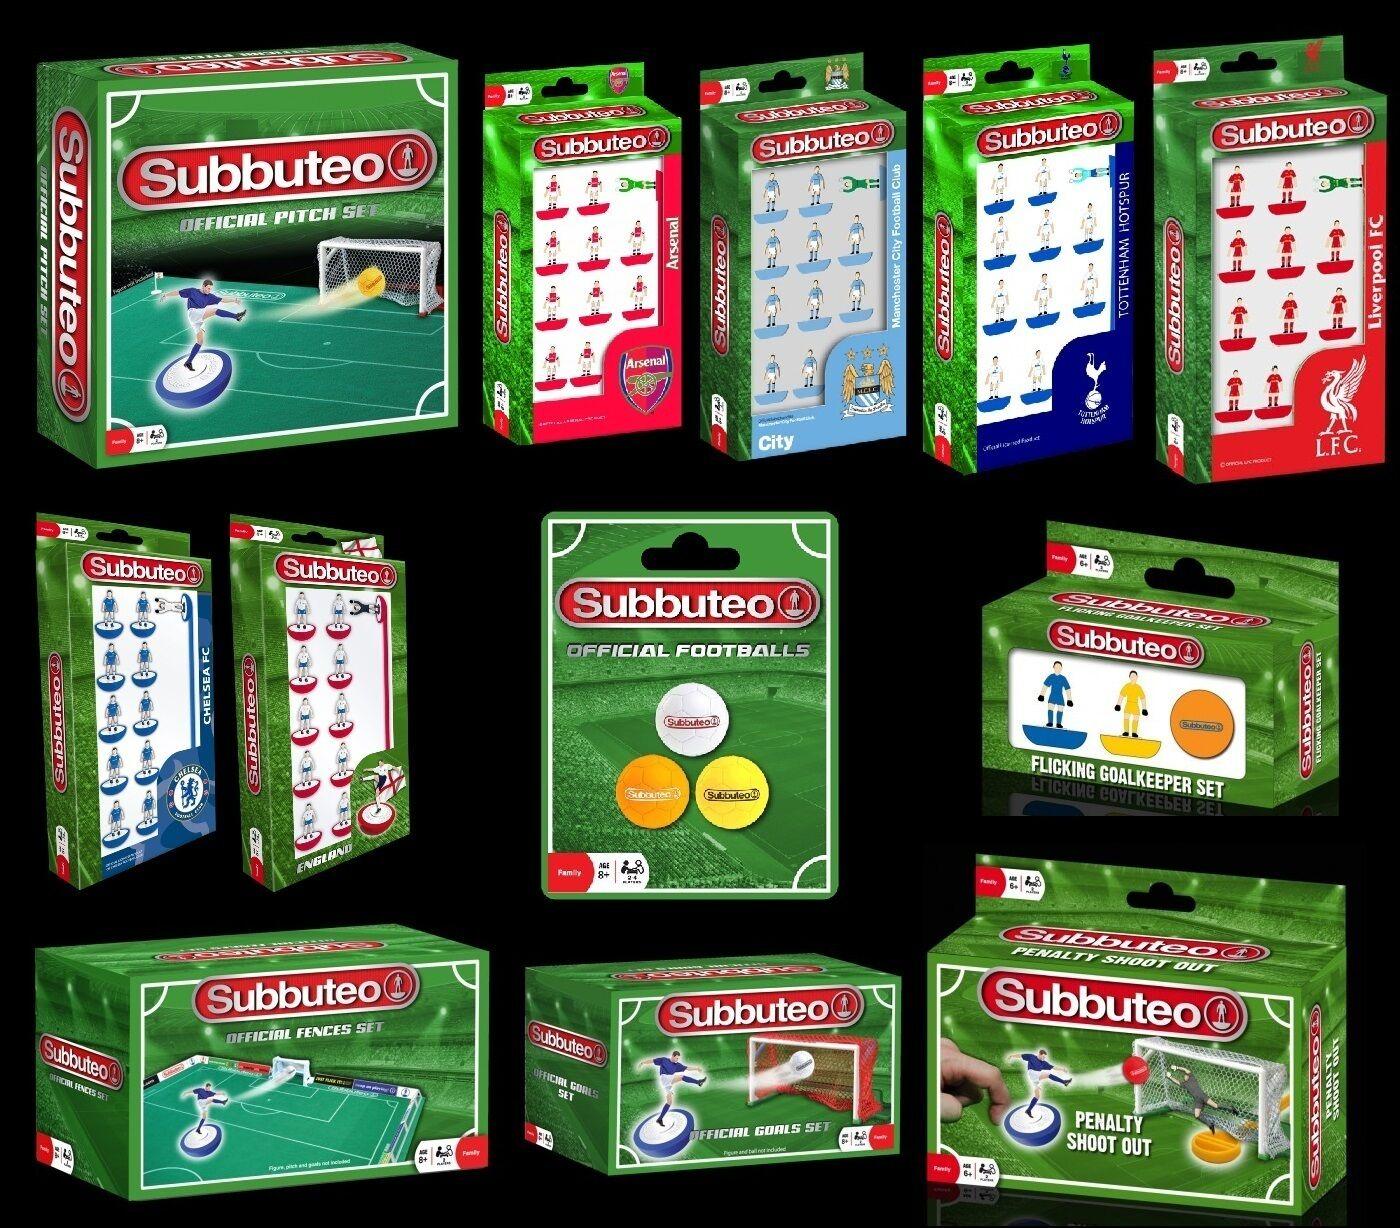 SUBBUTEO Table Football Game (BRAND NEW) Teams & Accessories {Paul Lamond Games}